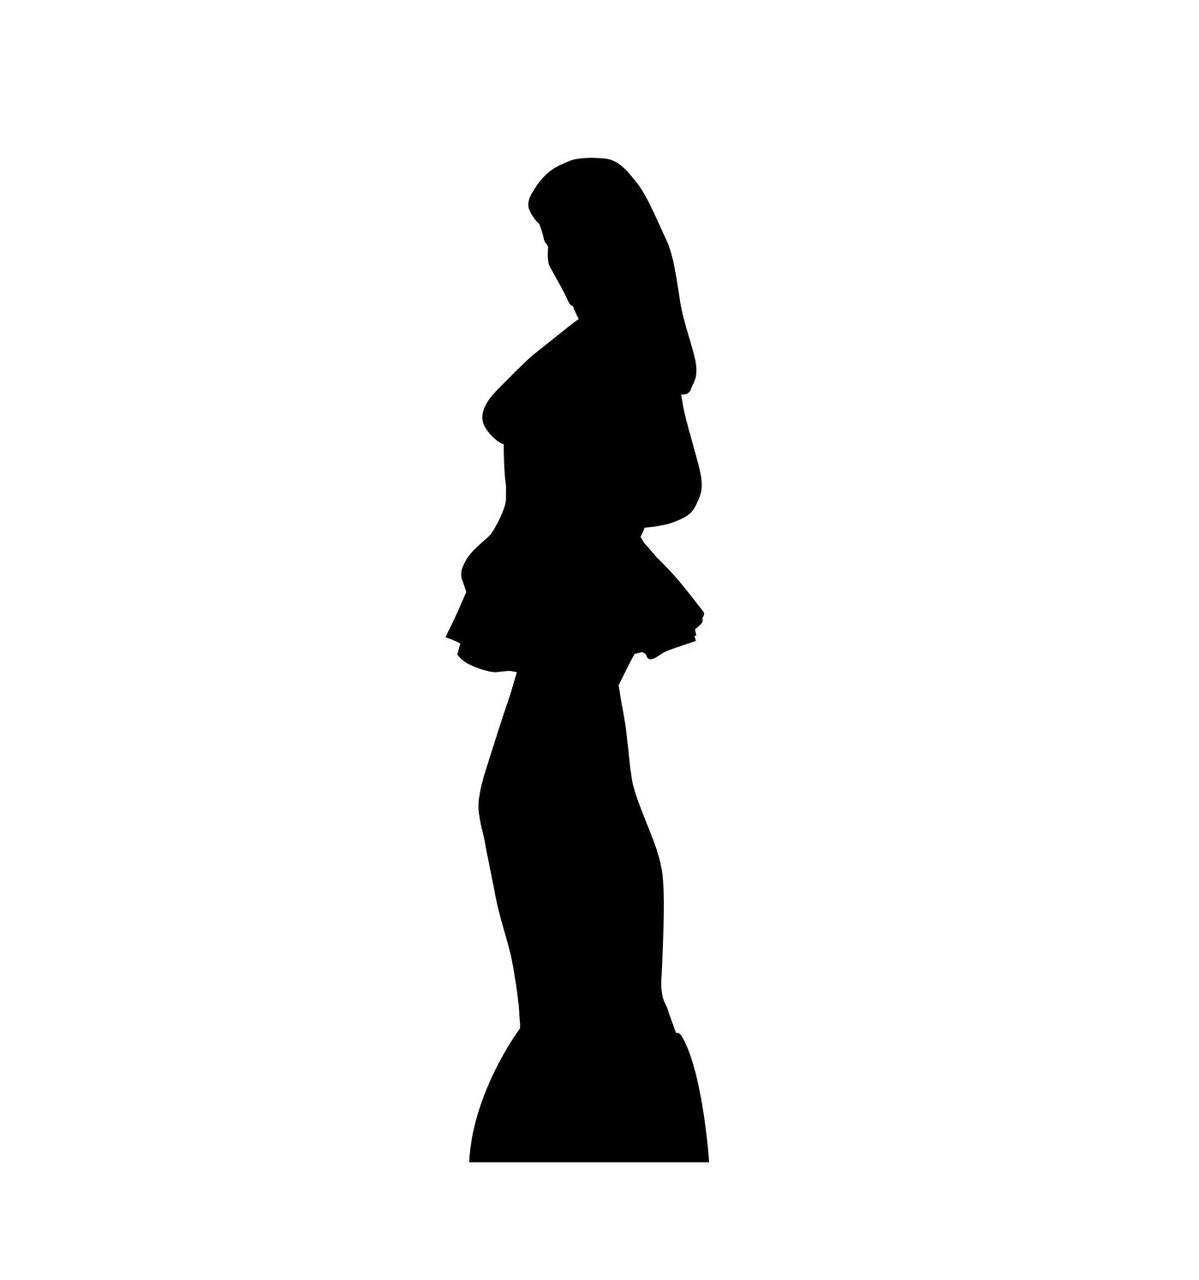 Ballerina Silhouette - Cardboard Cutout